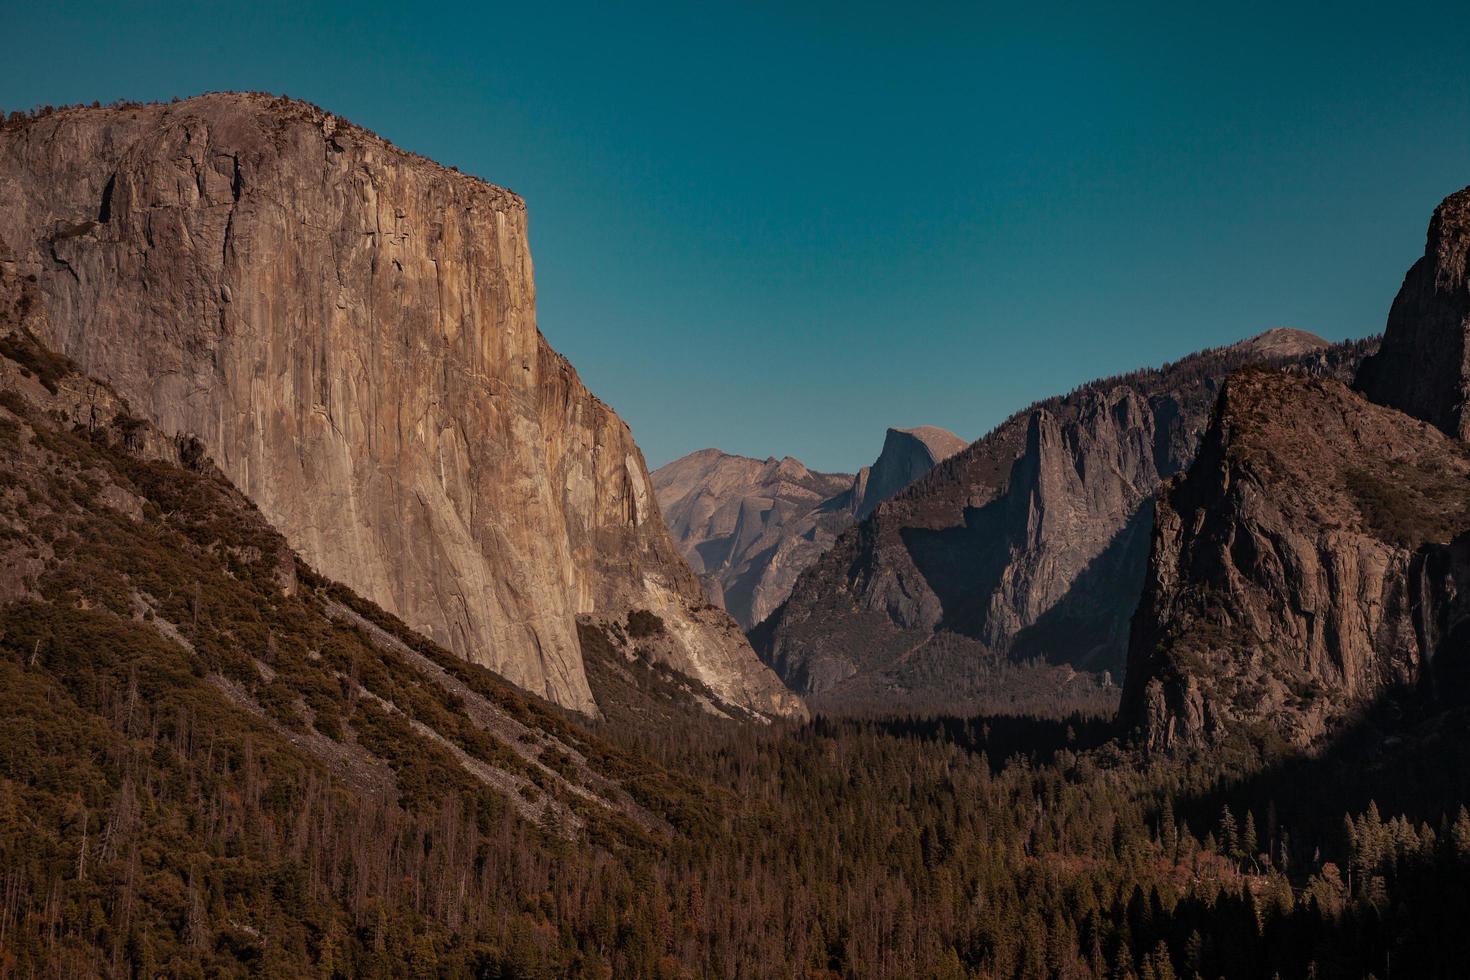 Yosemite Valley landscape. photo